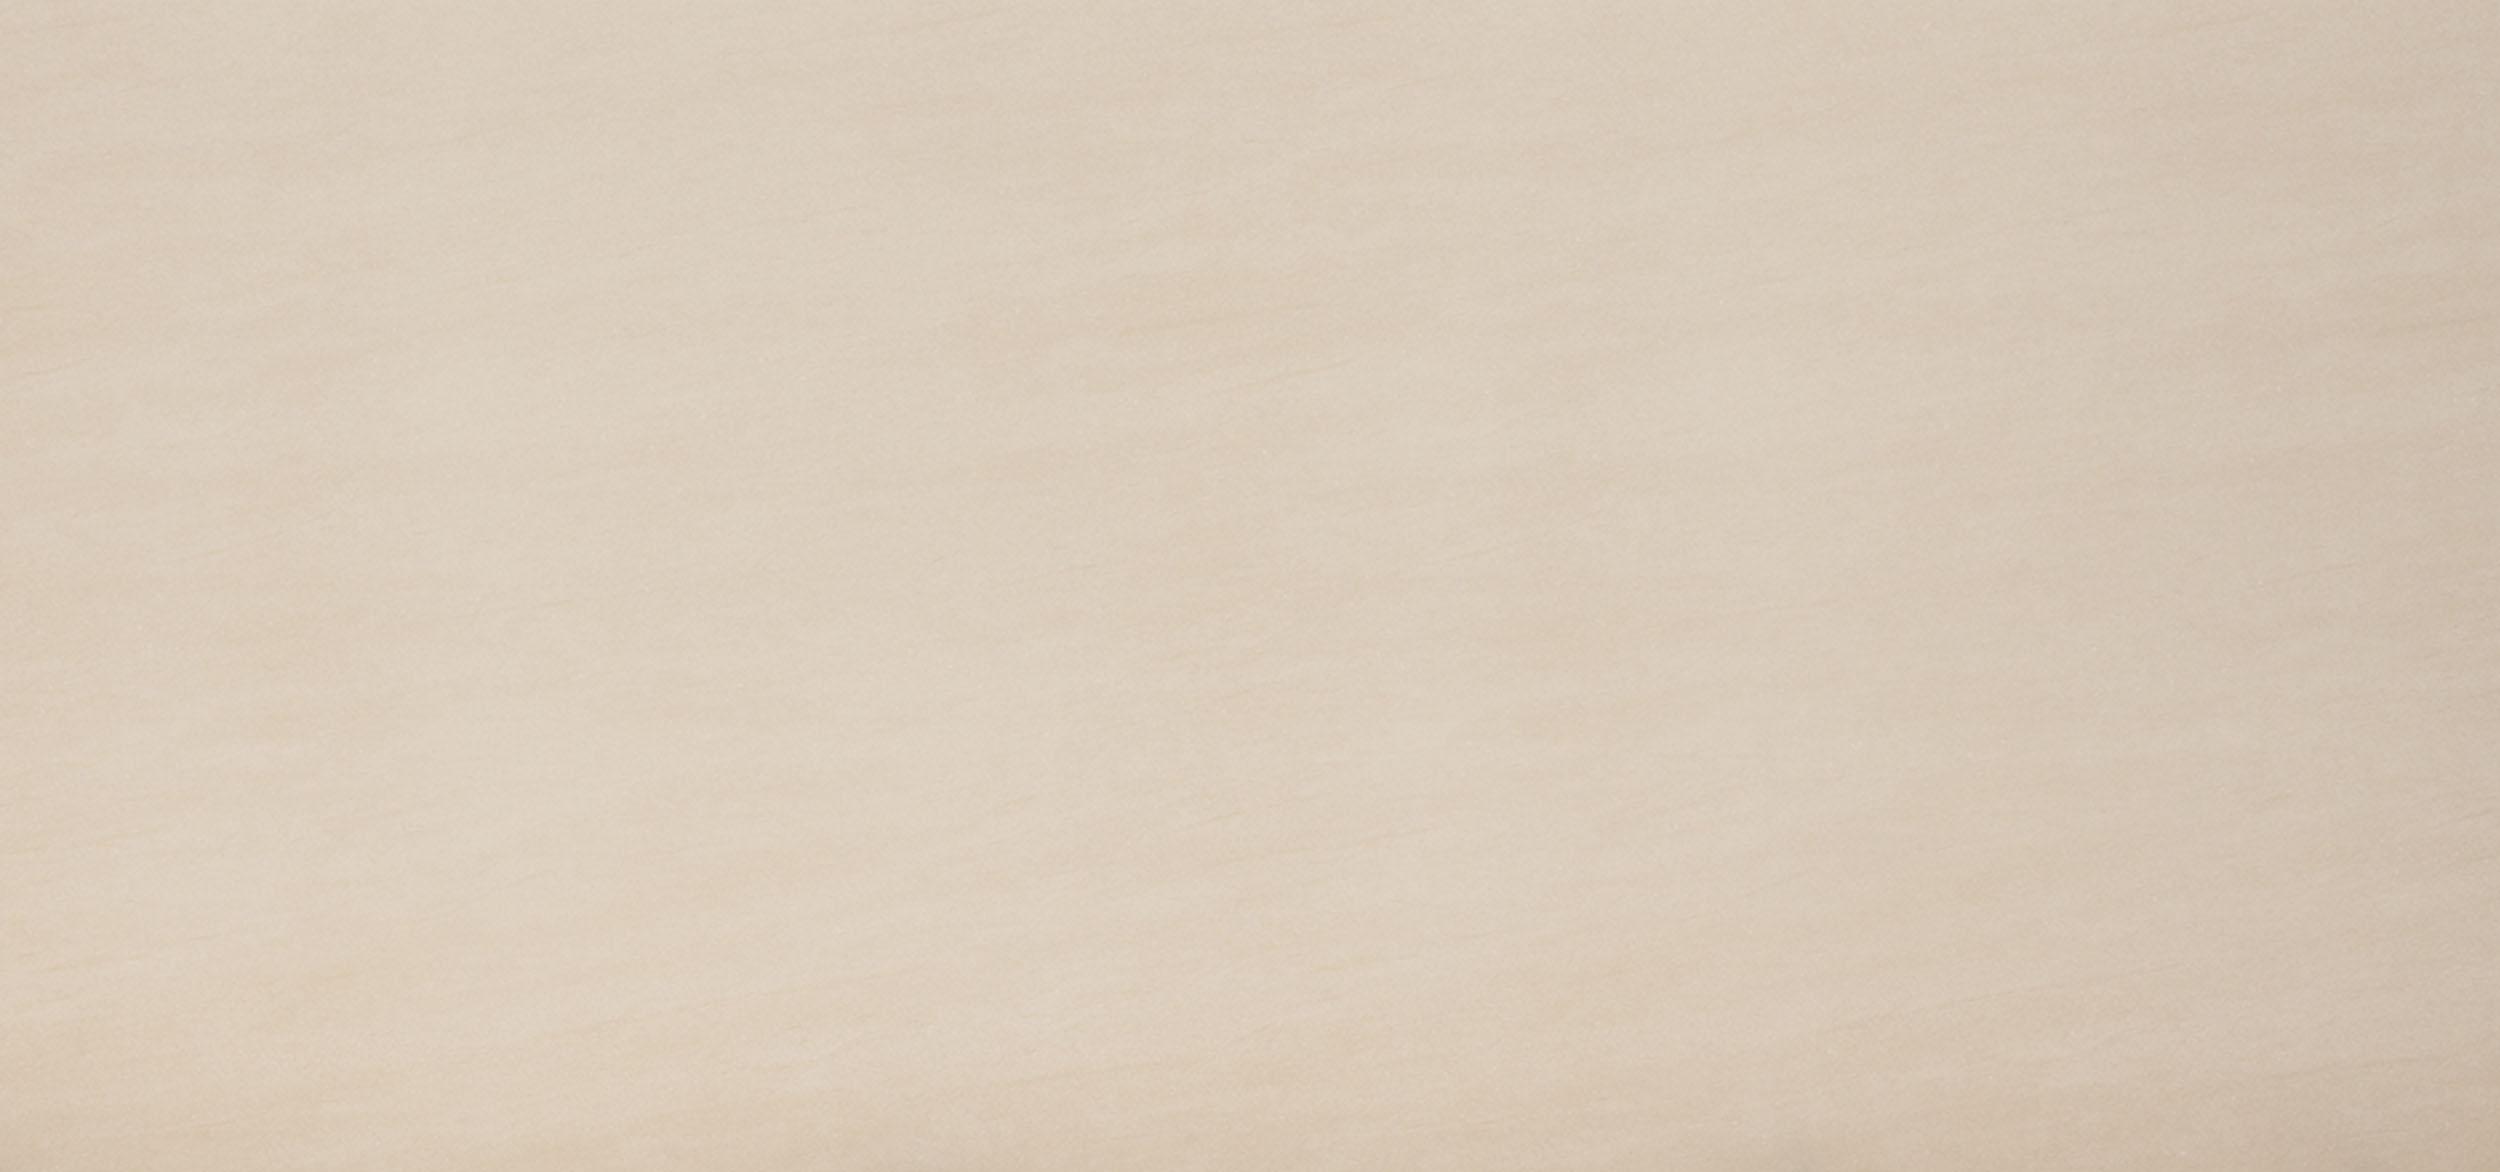 basalt-beige.jpg